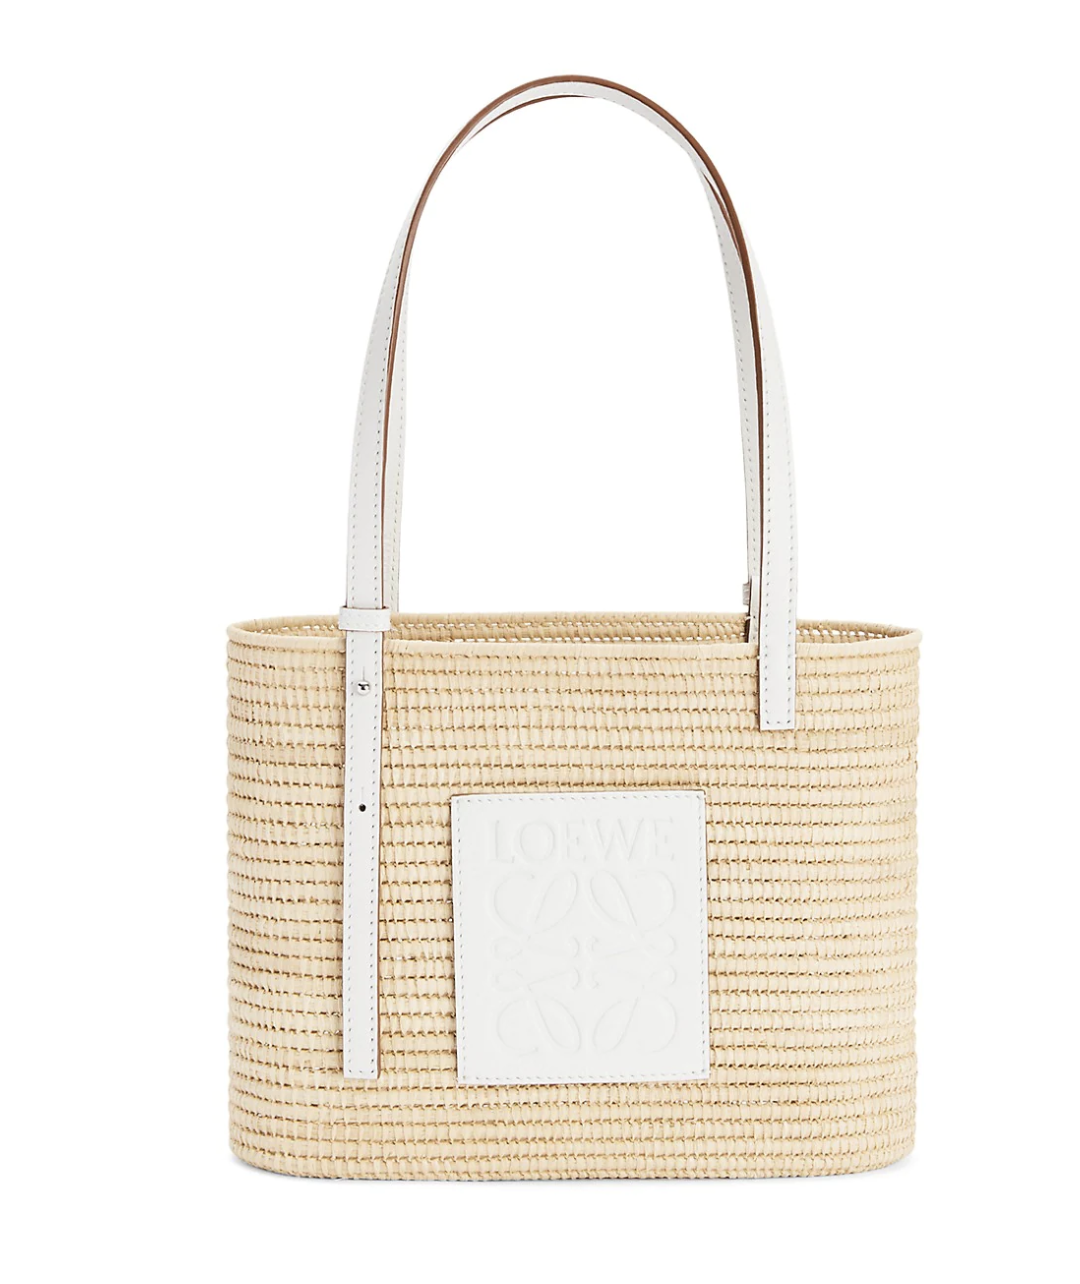 loewe raffia bag, straw bag, summer essentials